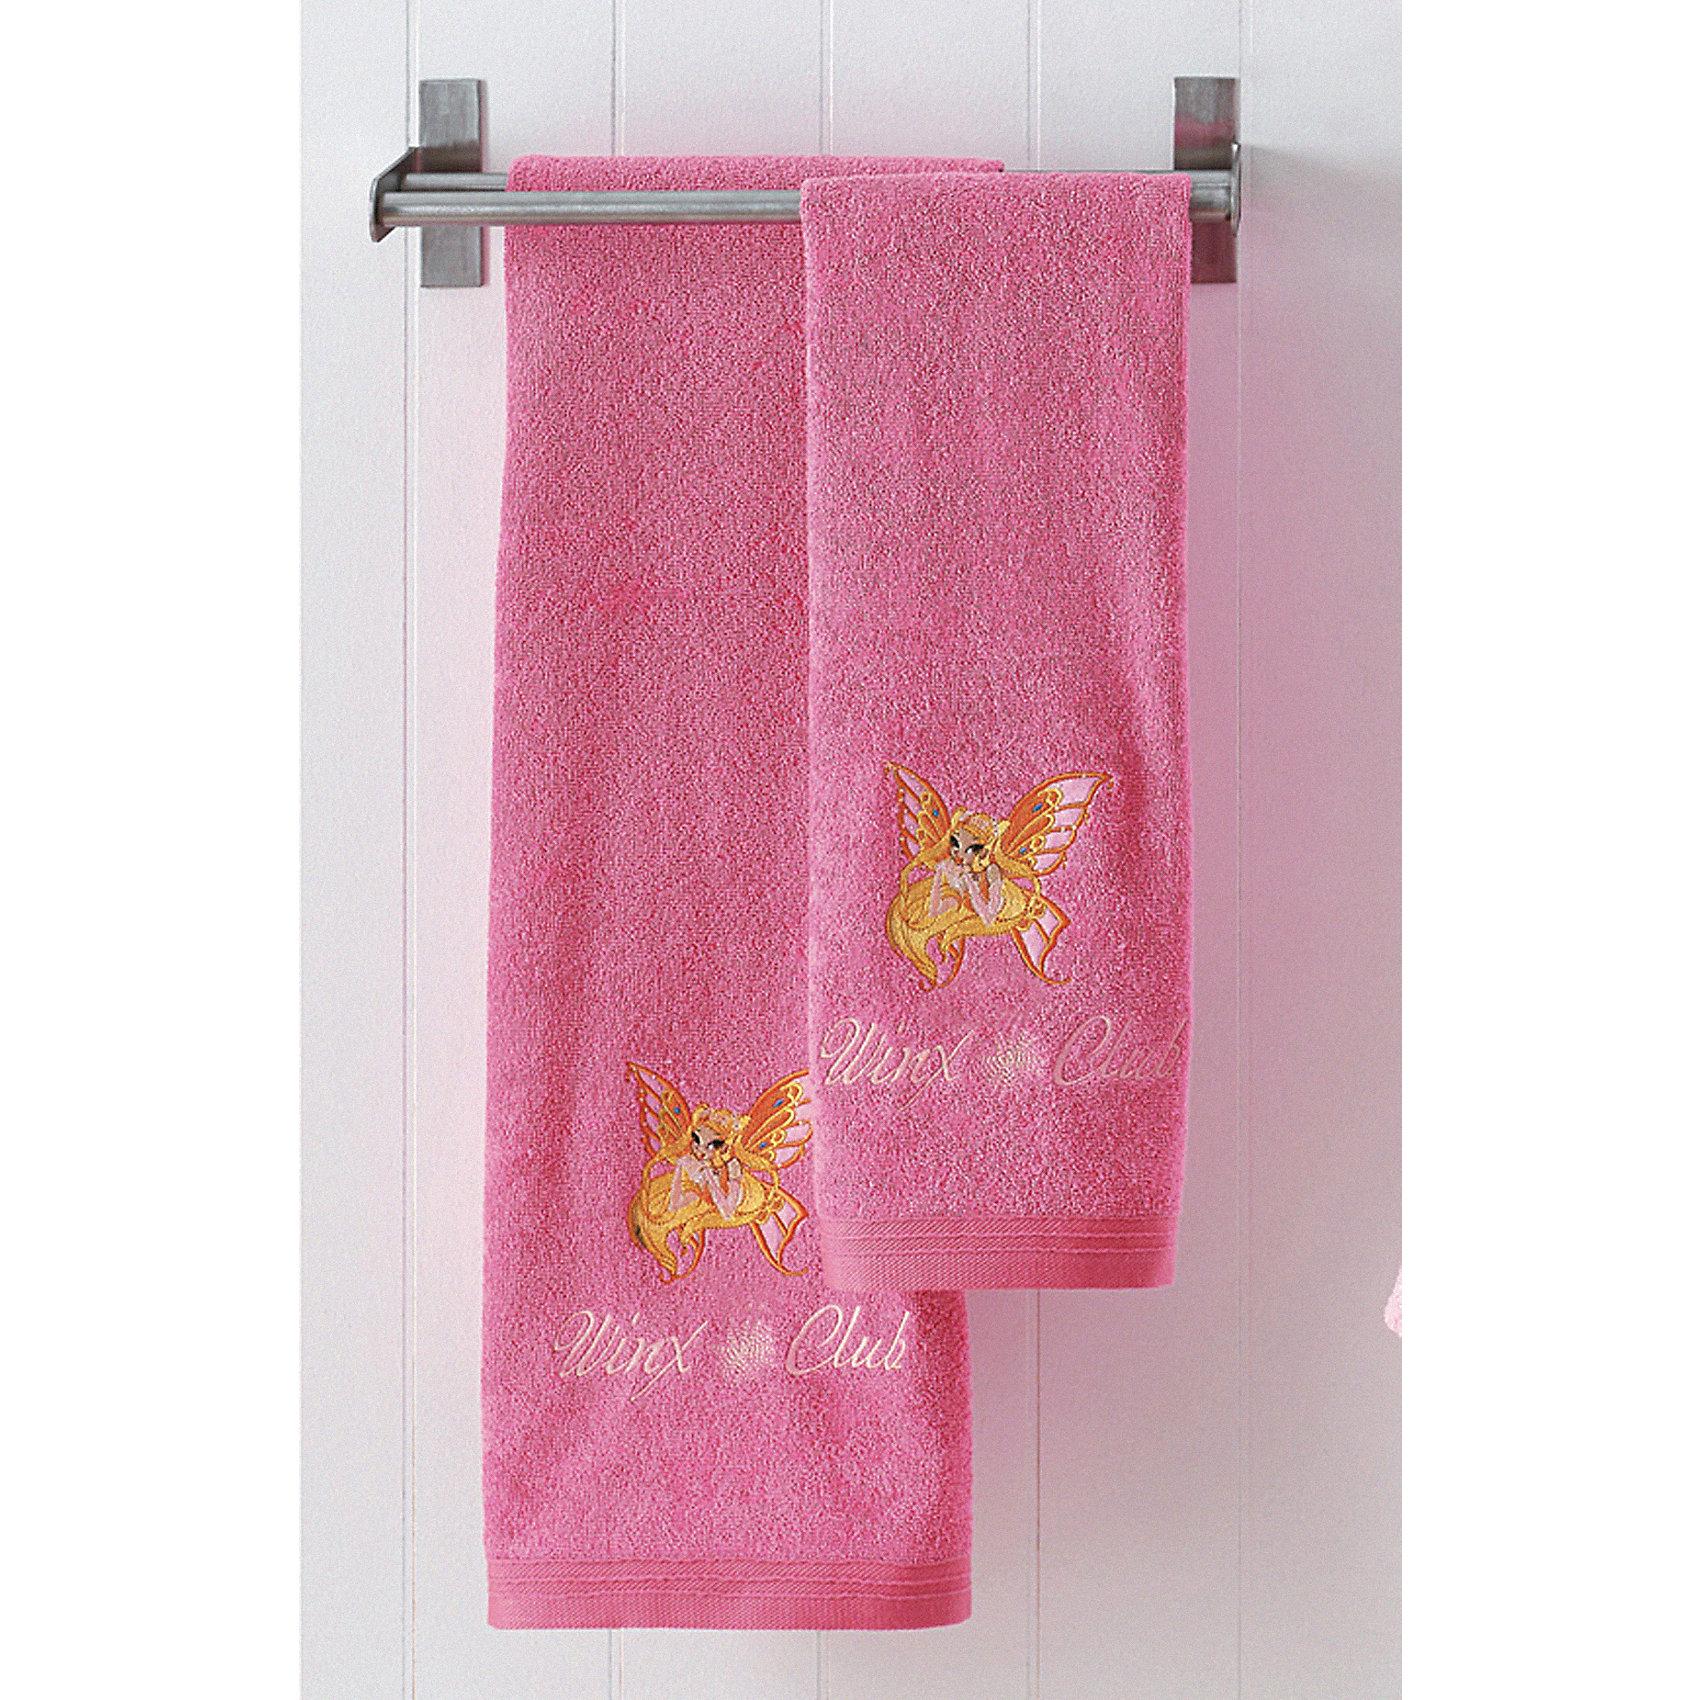 Махровое полотенце «Winx Club Стелла» 70*130 см